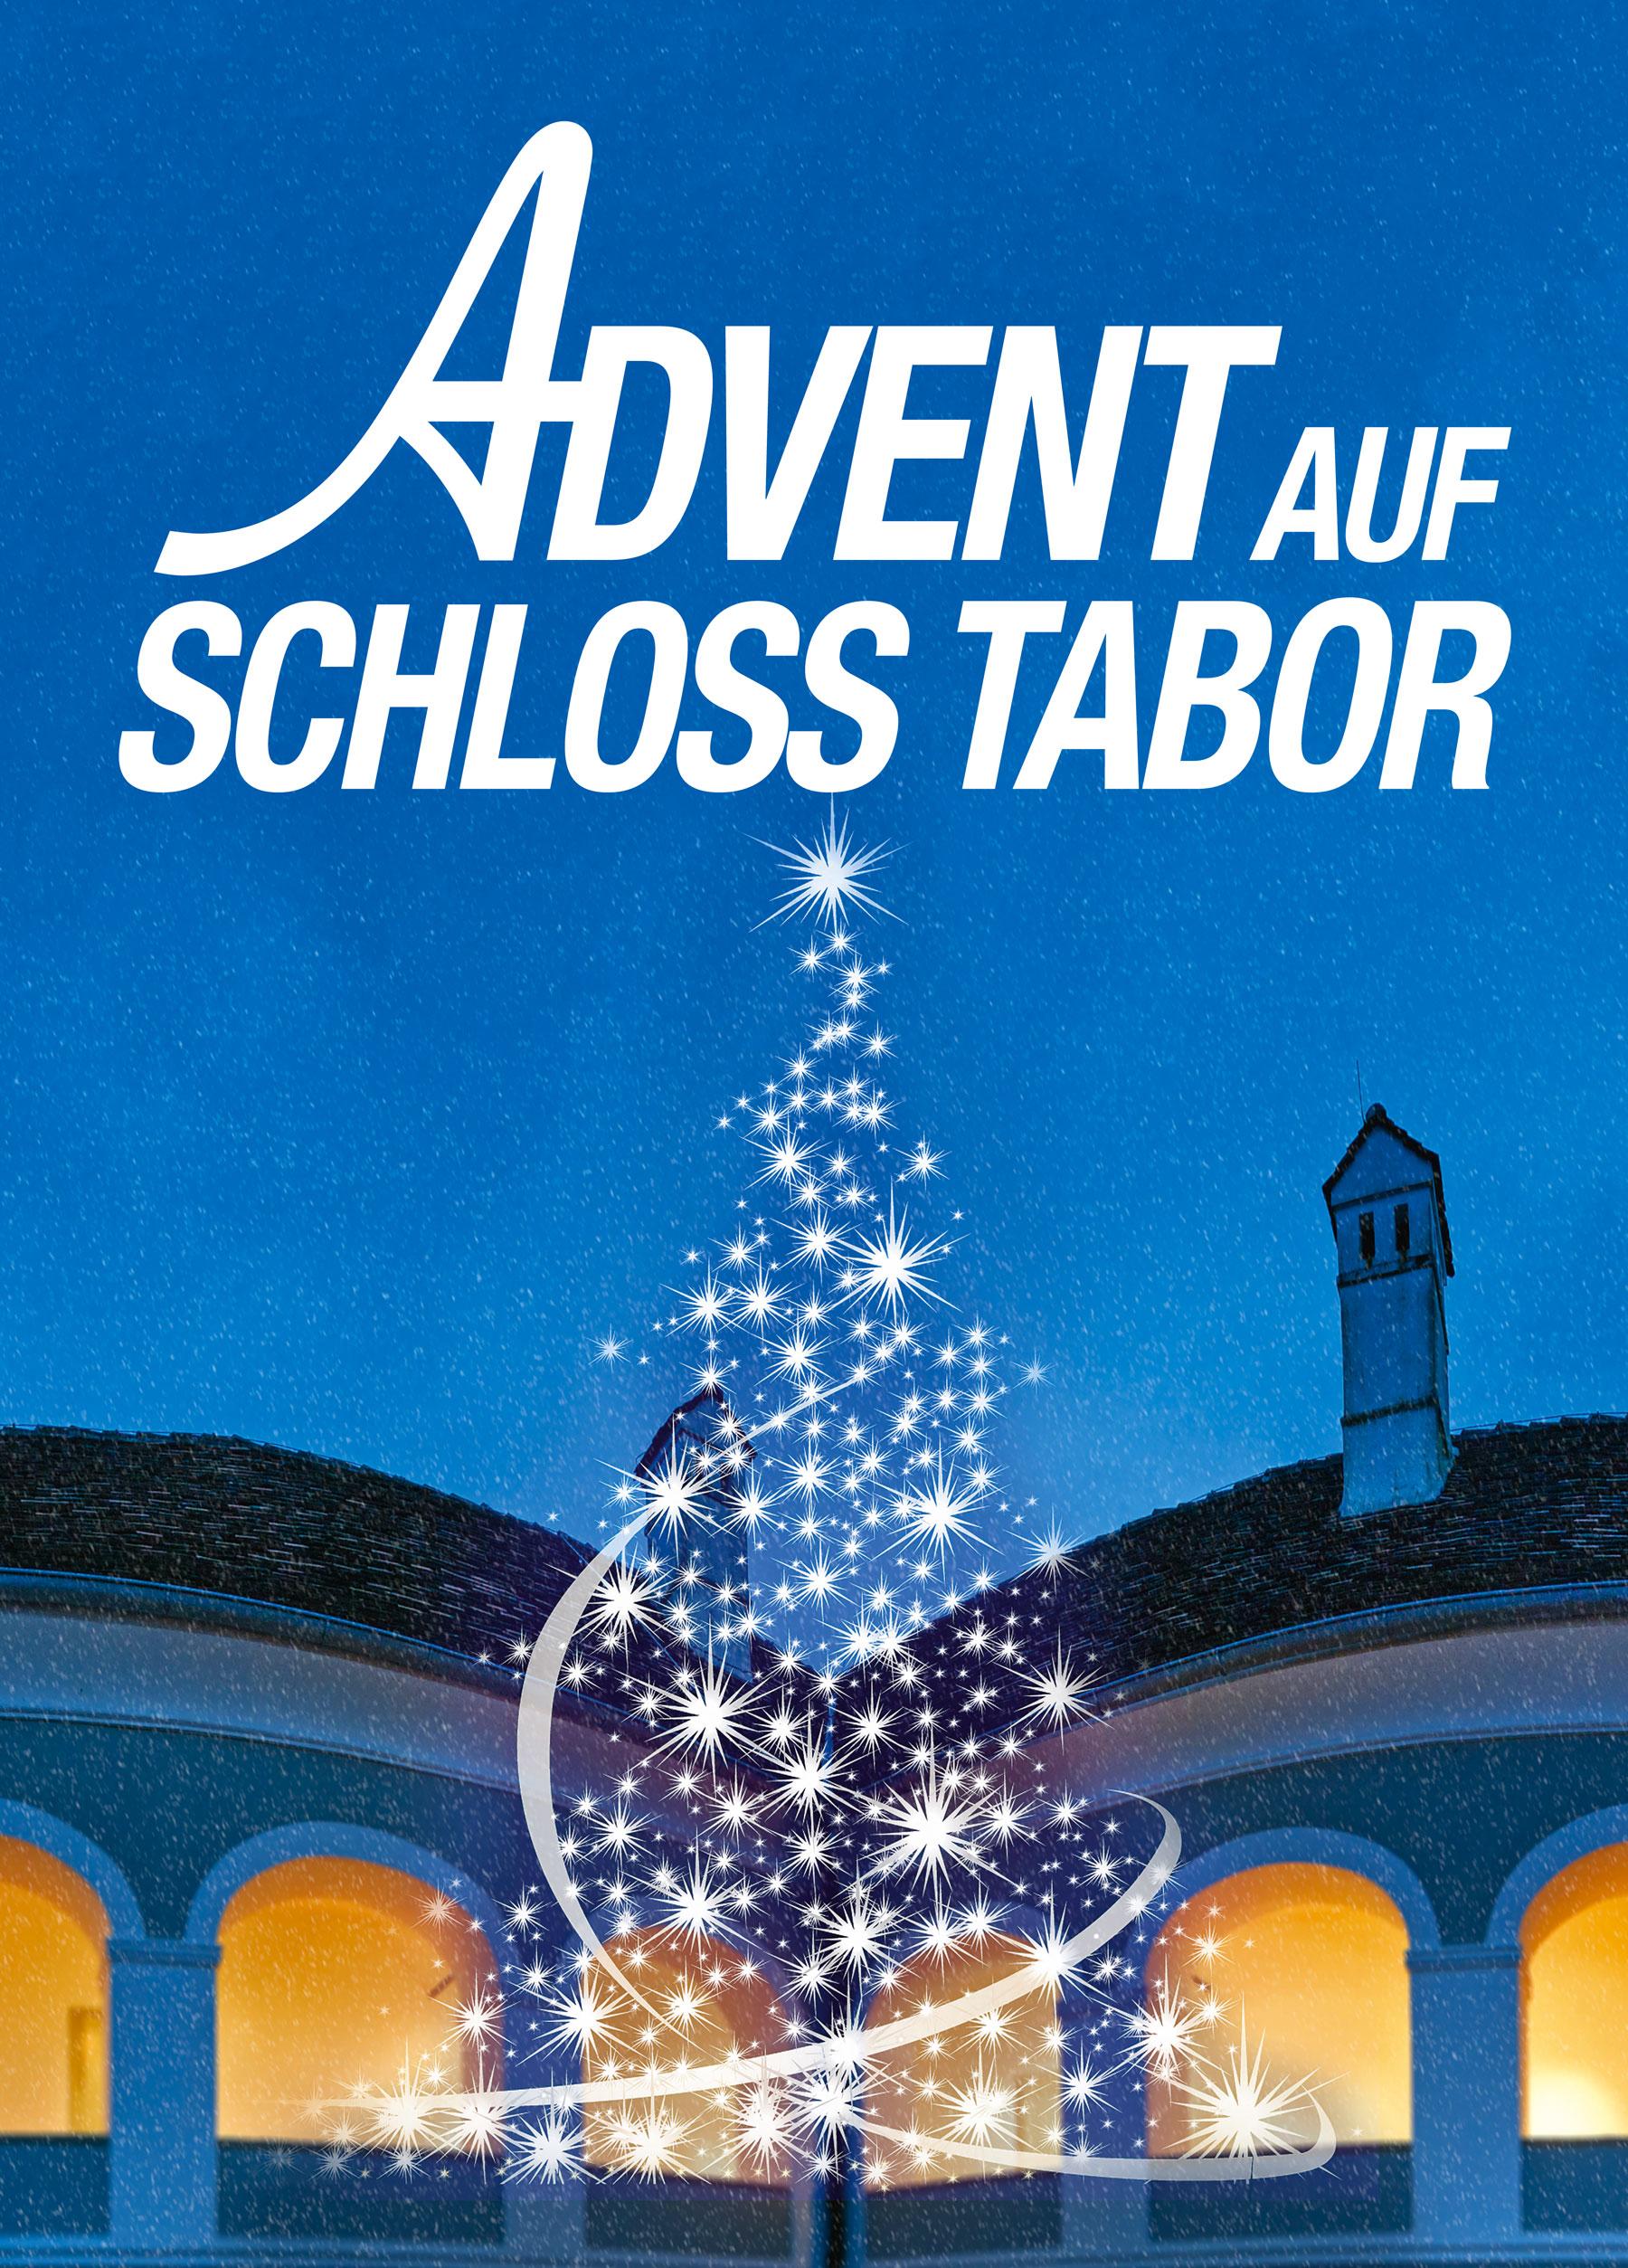 advent-auf-schloss-tabor-2016